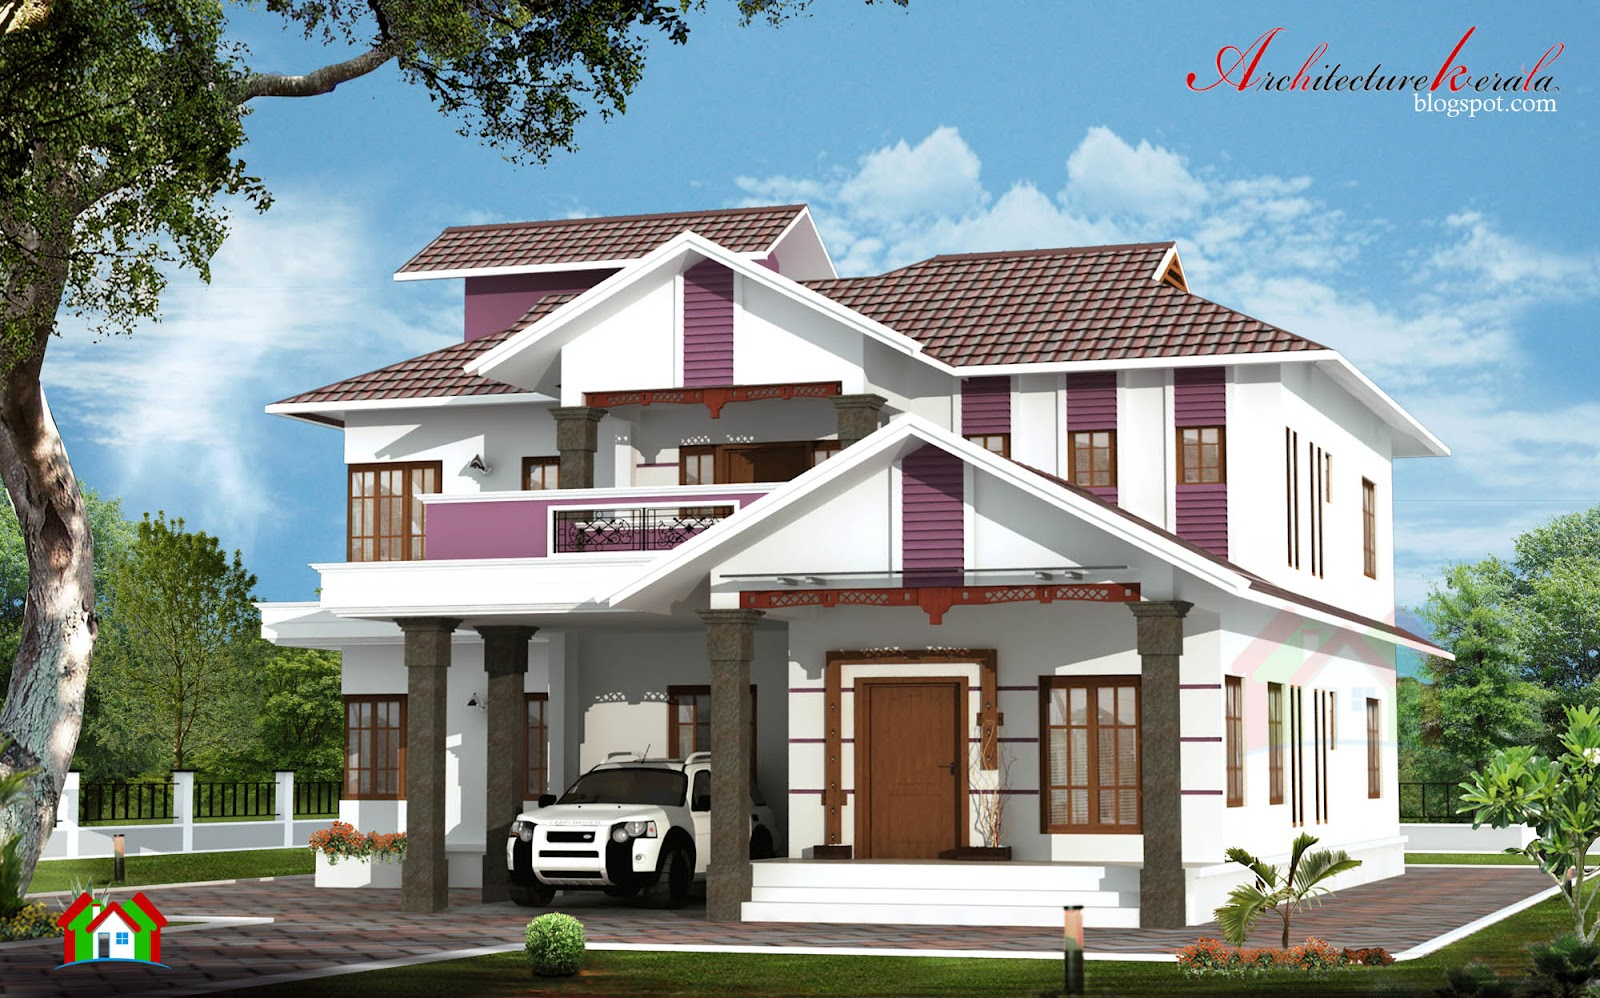 2400 Sq Ft 4 BHK KERALA HOUSE DESIGN ARCHITECTURE KERALA